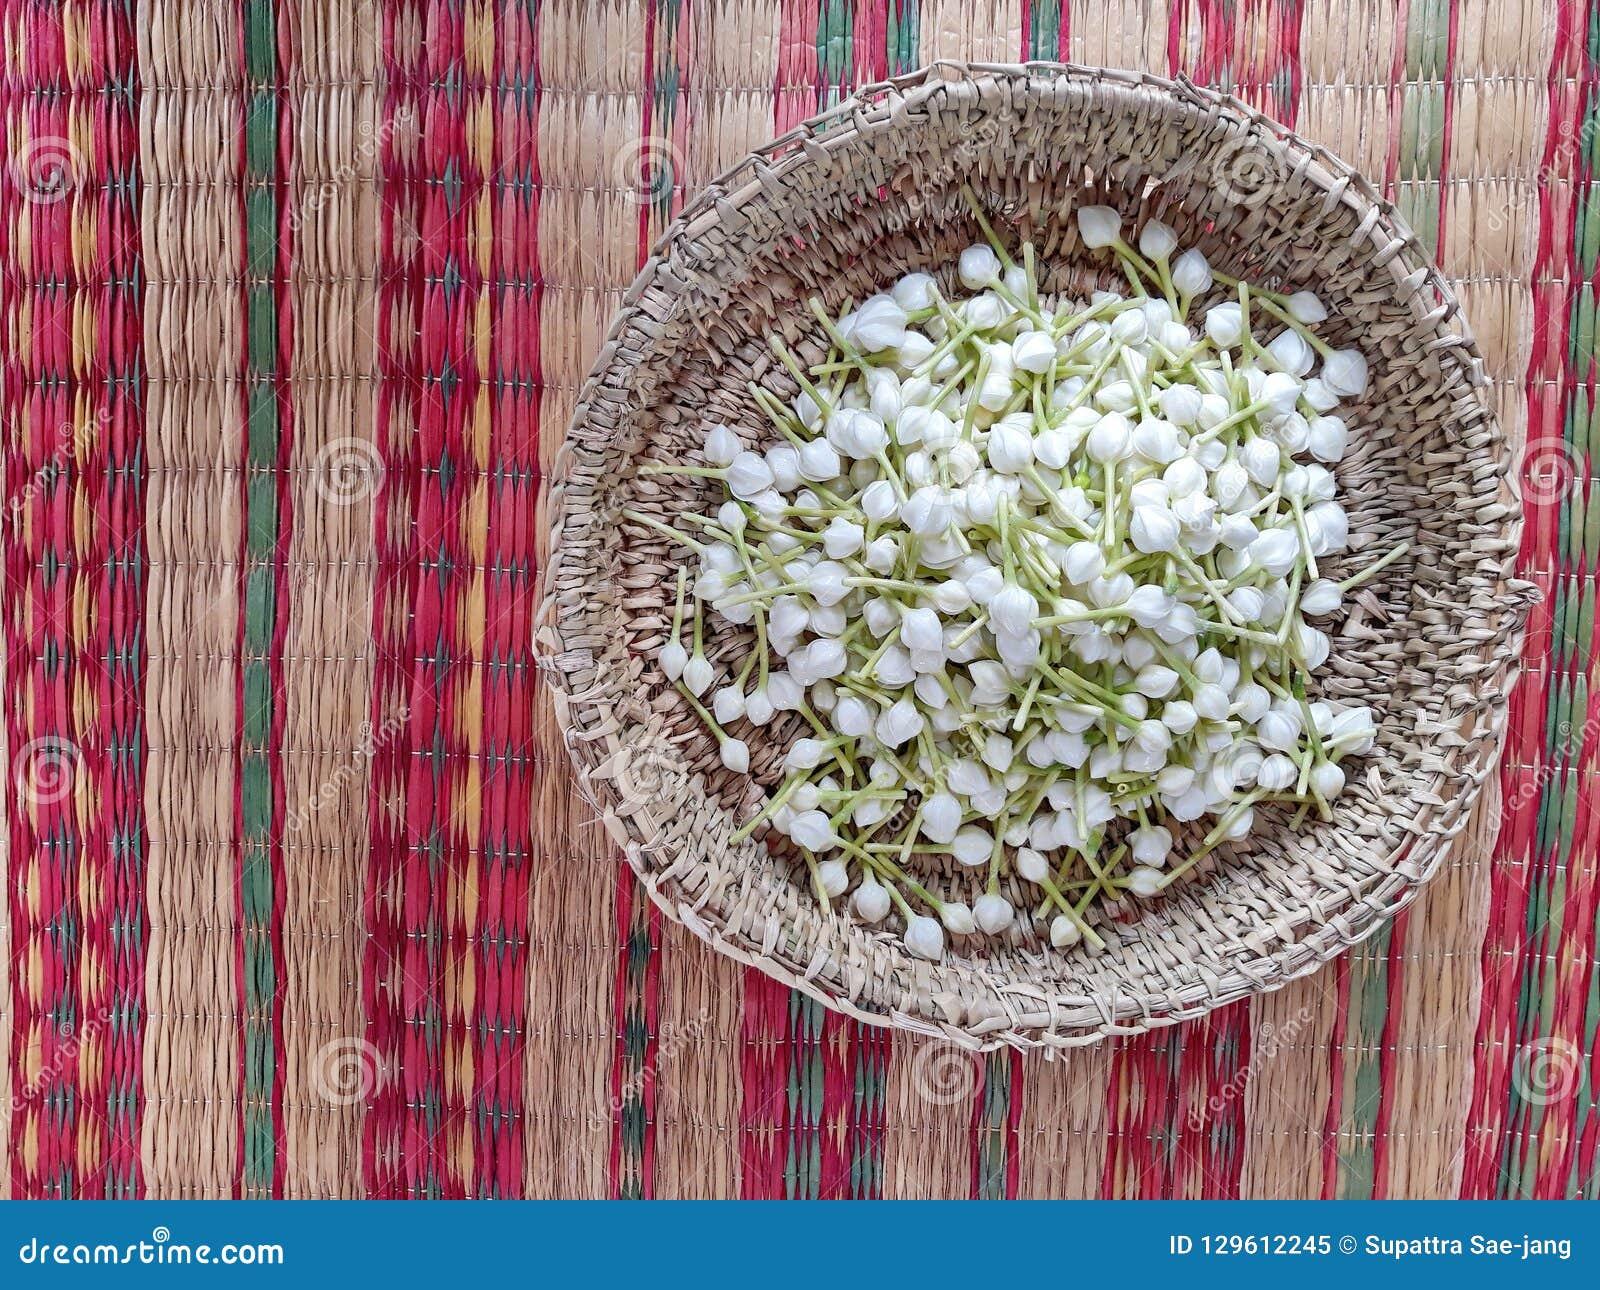 gardenia cape jasmine flower in a basket